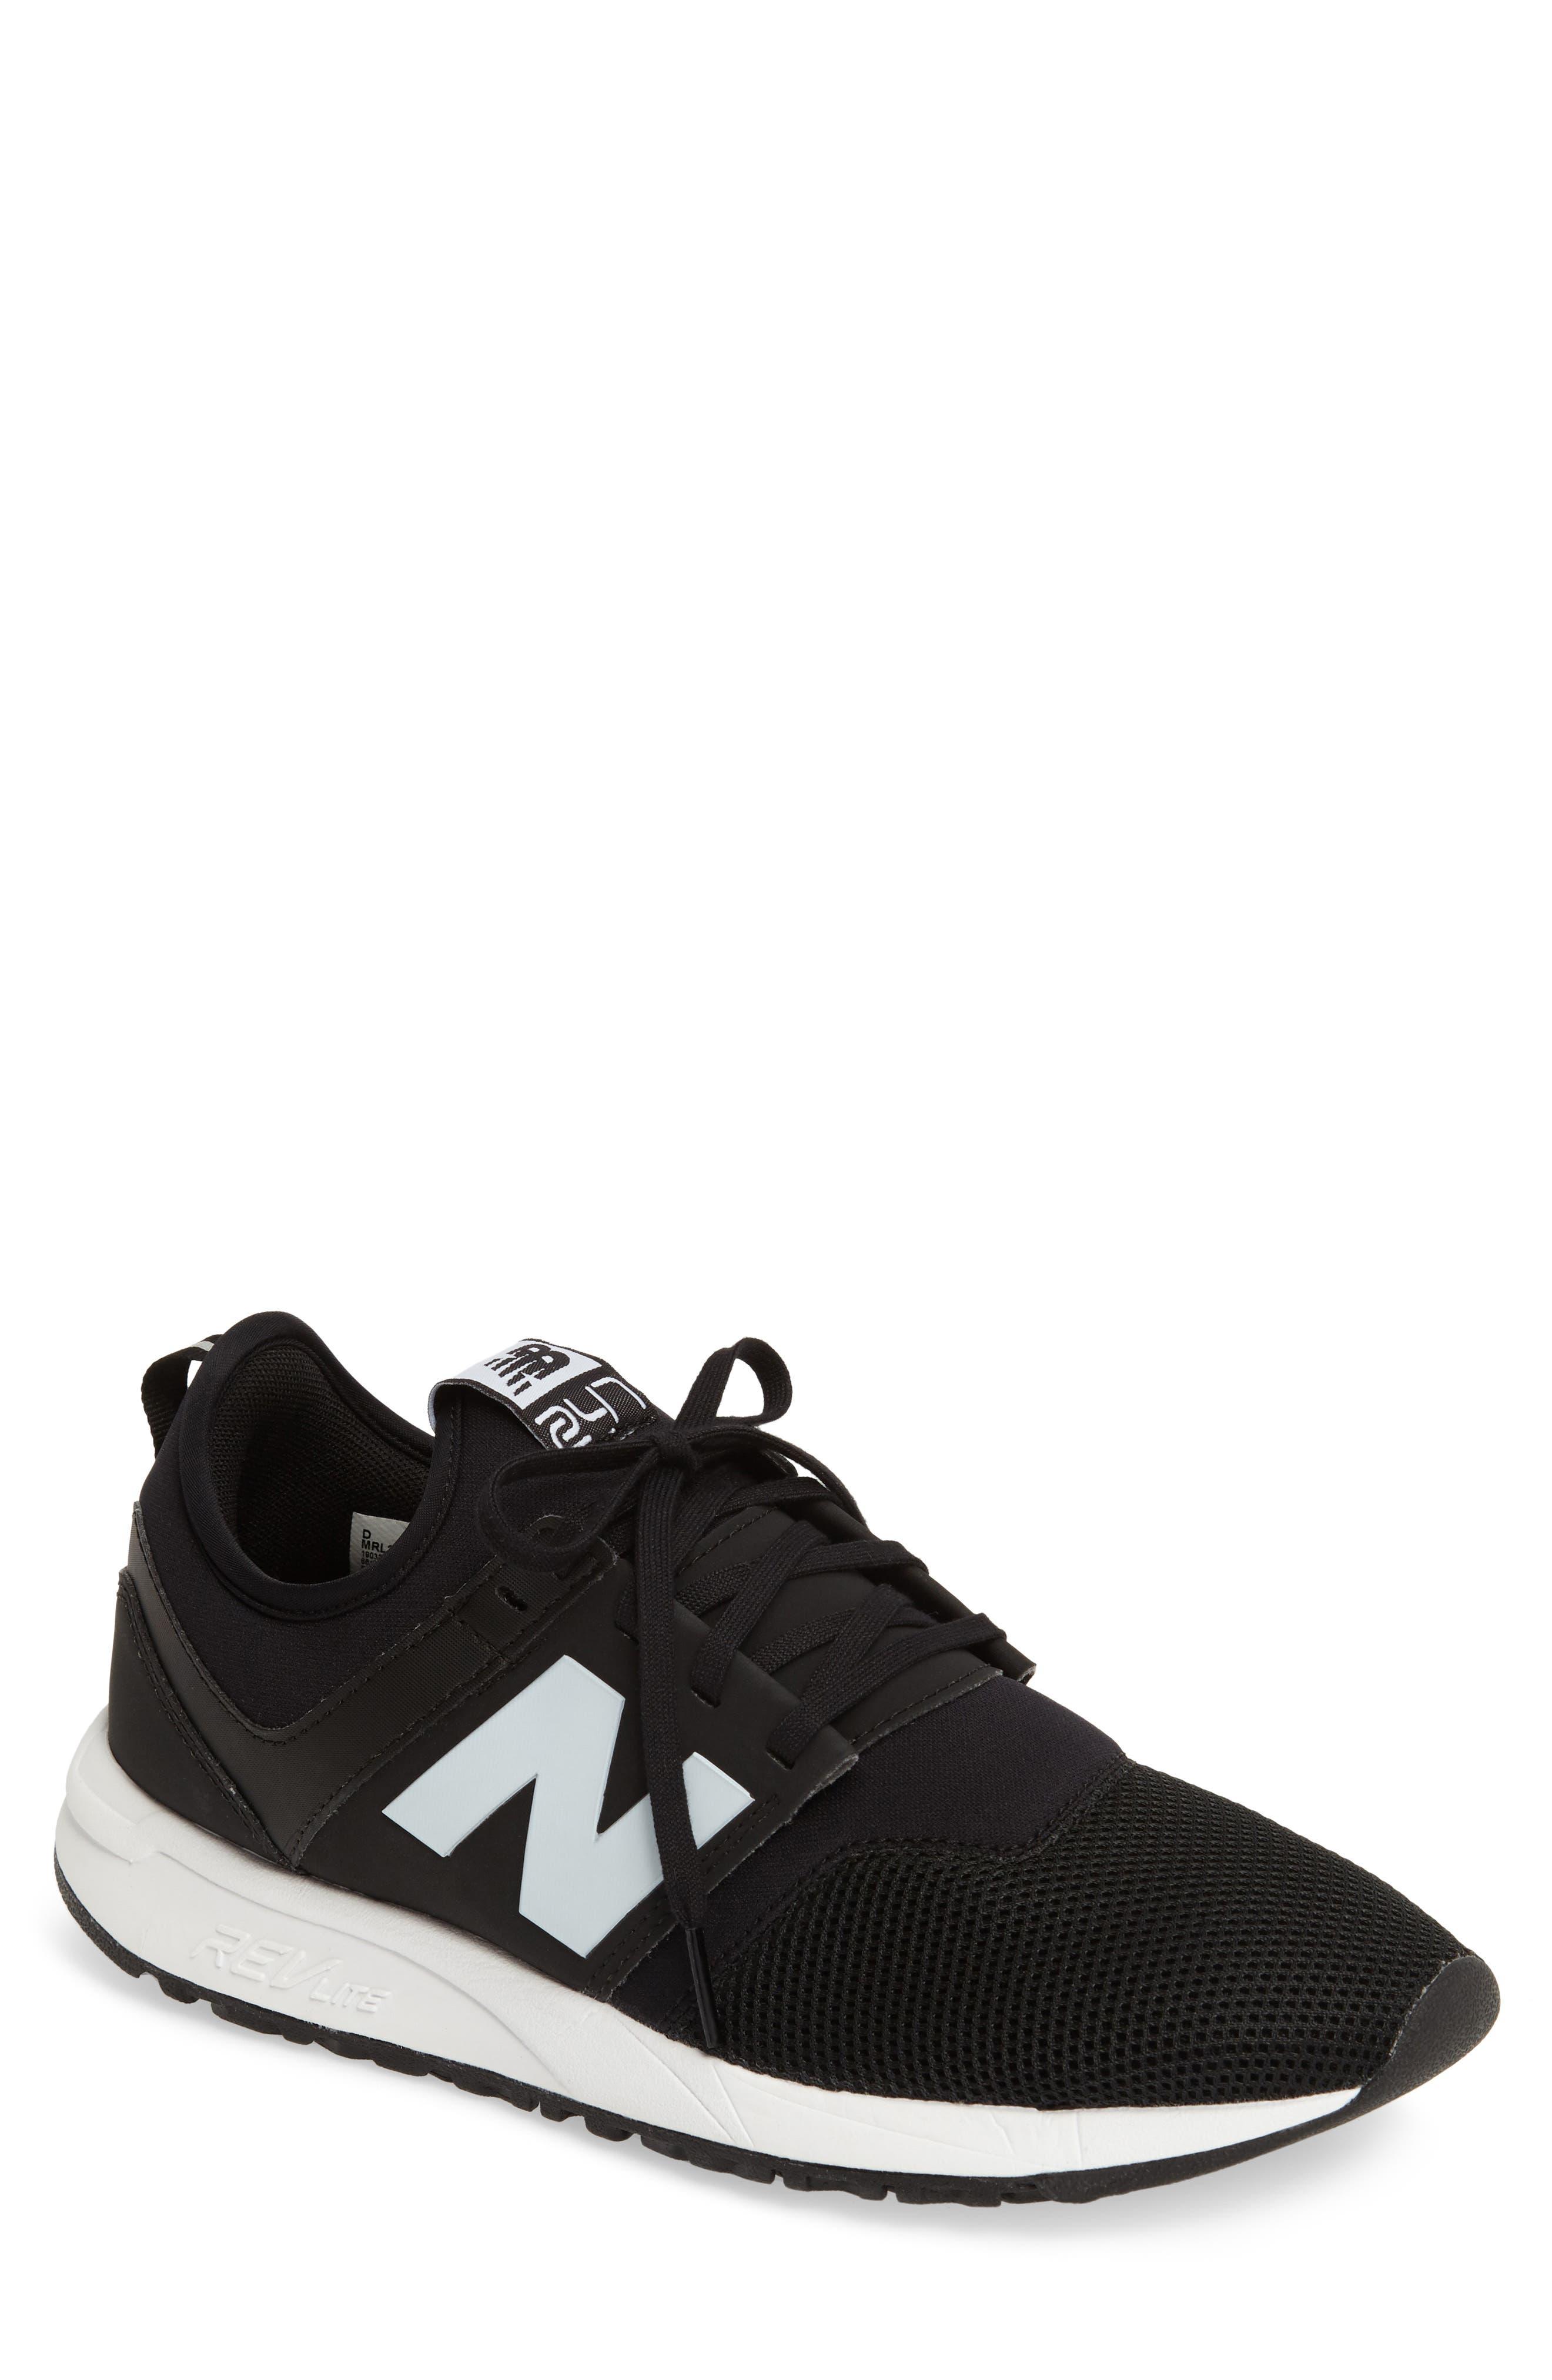 247 Modern Classic Sneaker,                             Main thumbnail 1, color,                             001